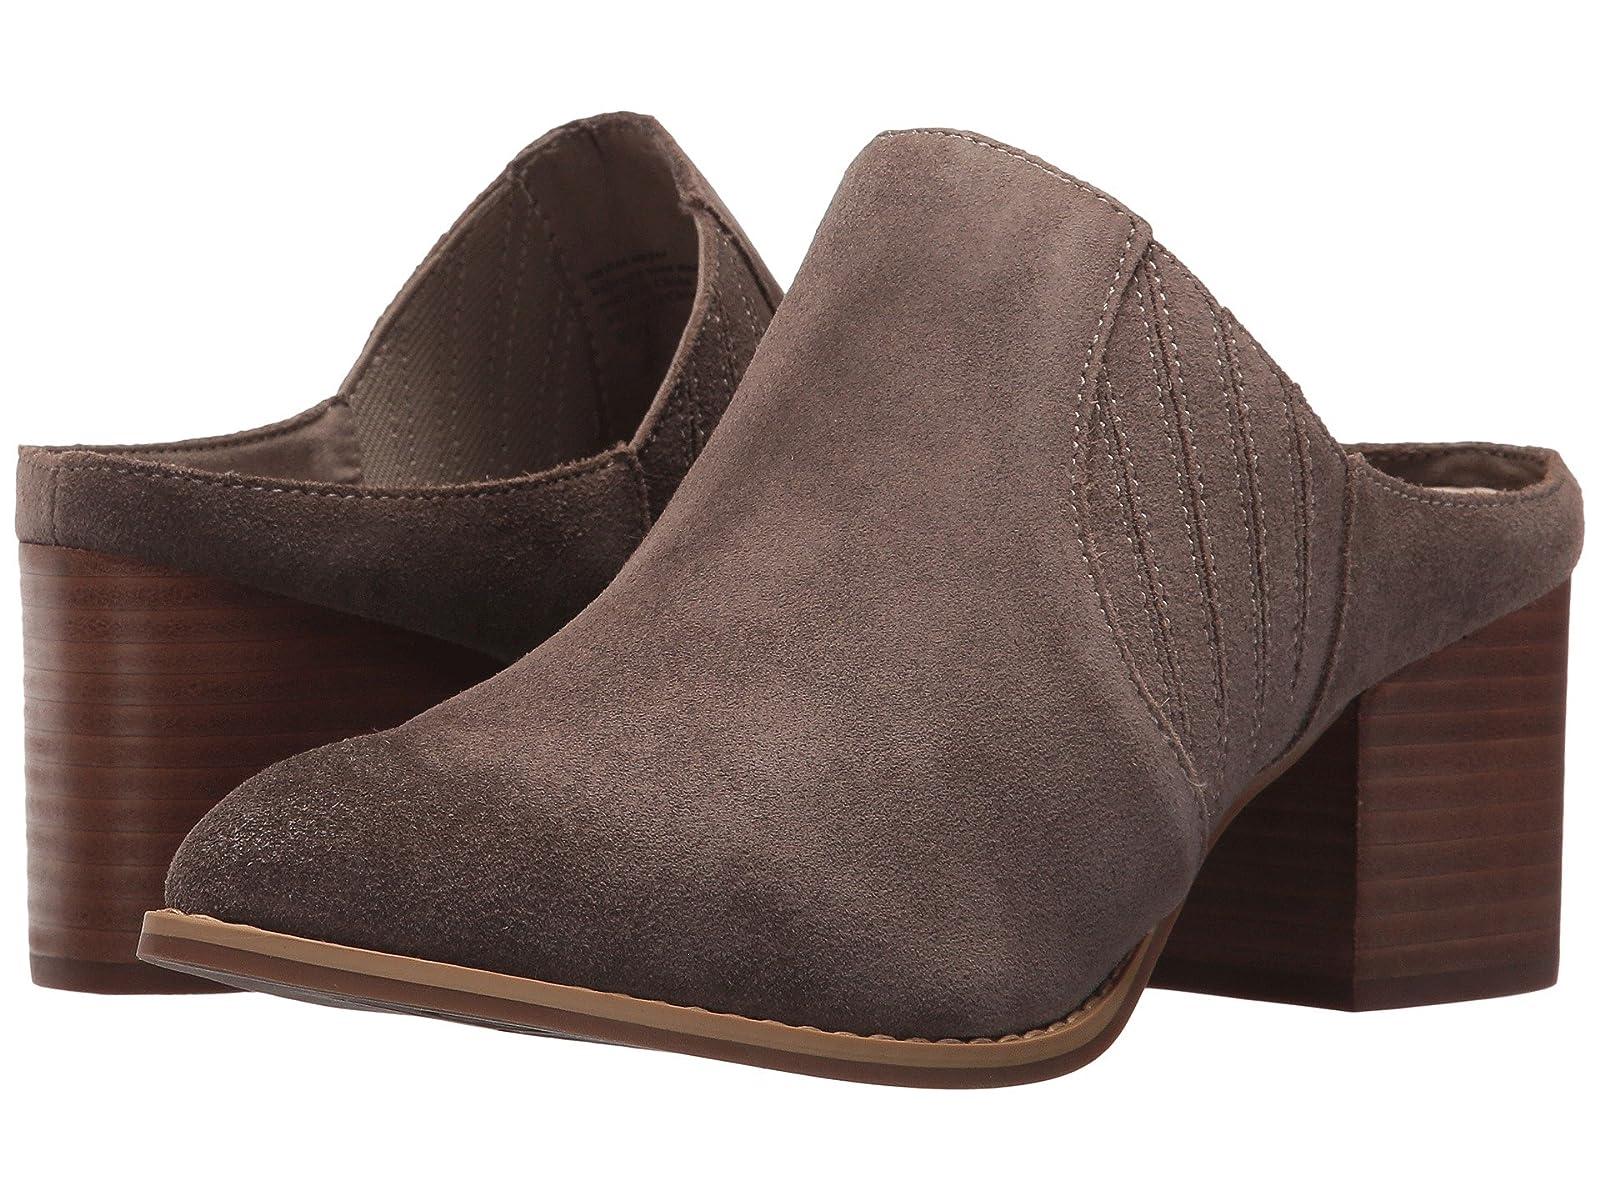 Seychelles DialogueCheap and distinctive eye-catching shoes